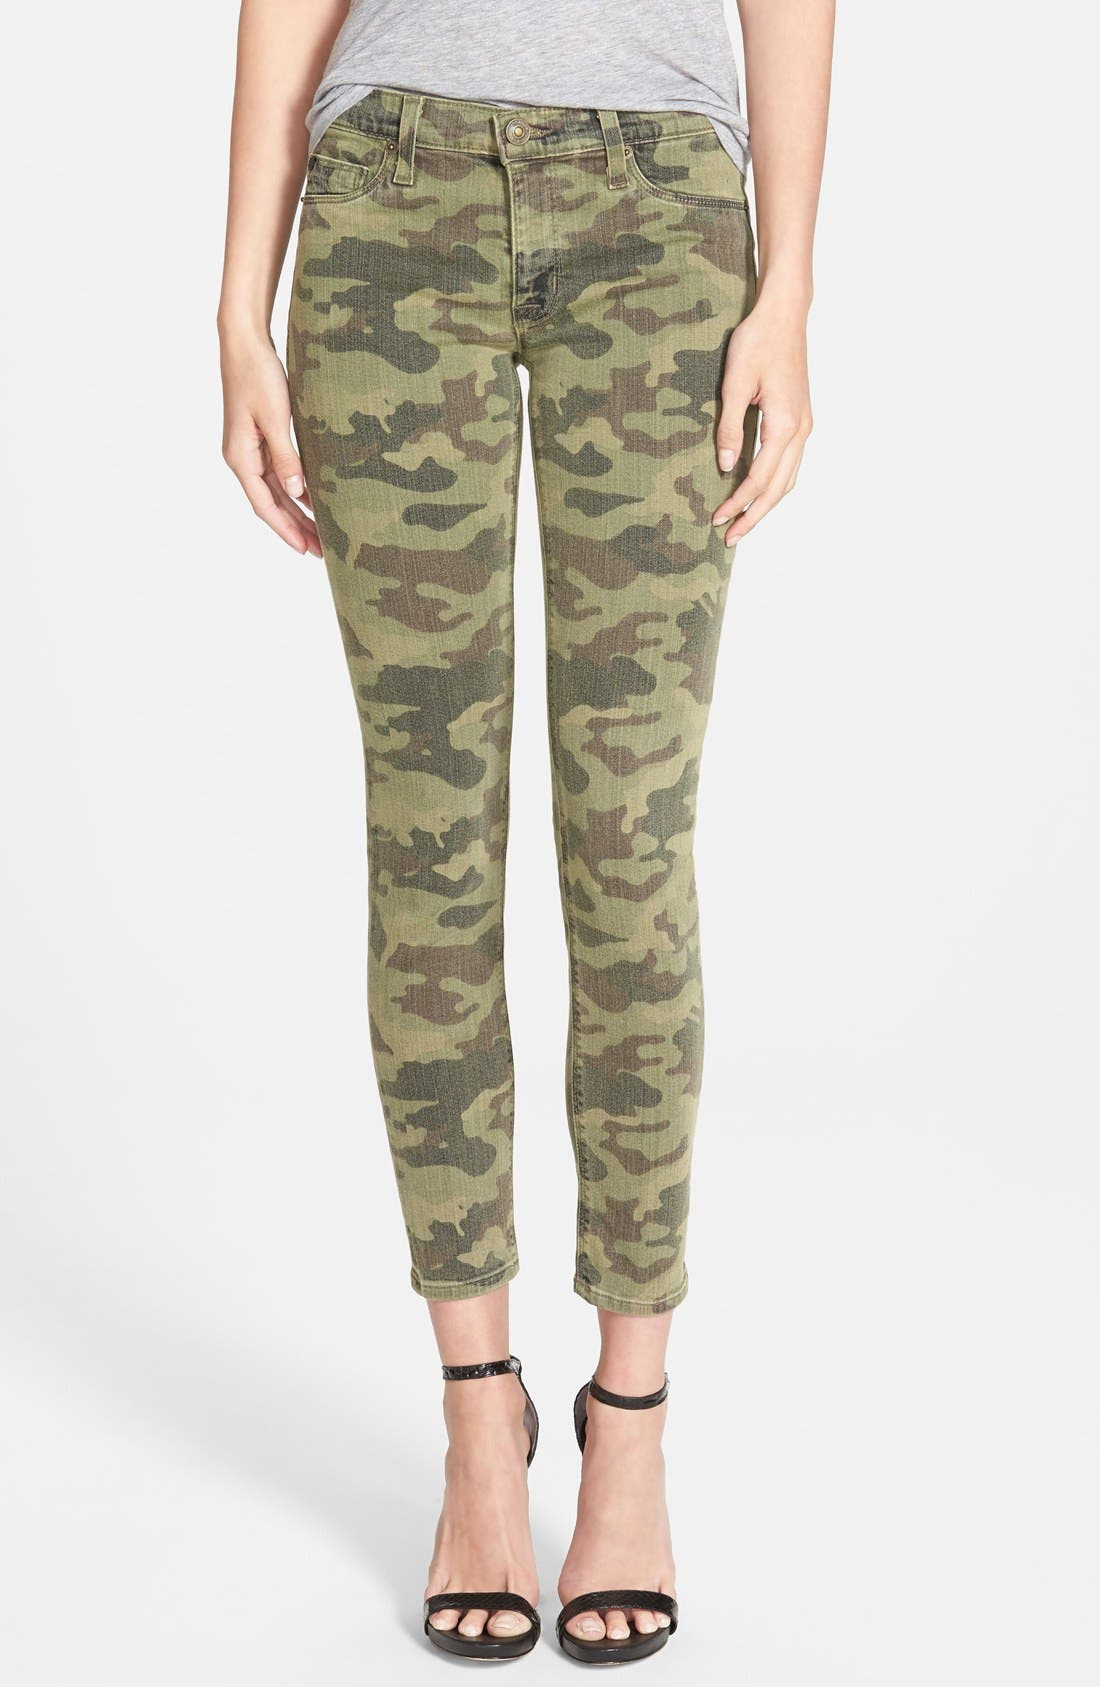 Alternate Image 1 Selected - Hudson Jeans 'Krista' Crop Jeans (Solimar Camo)